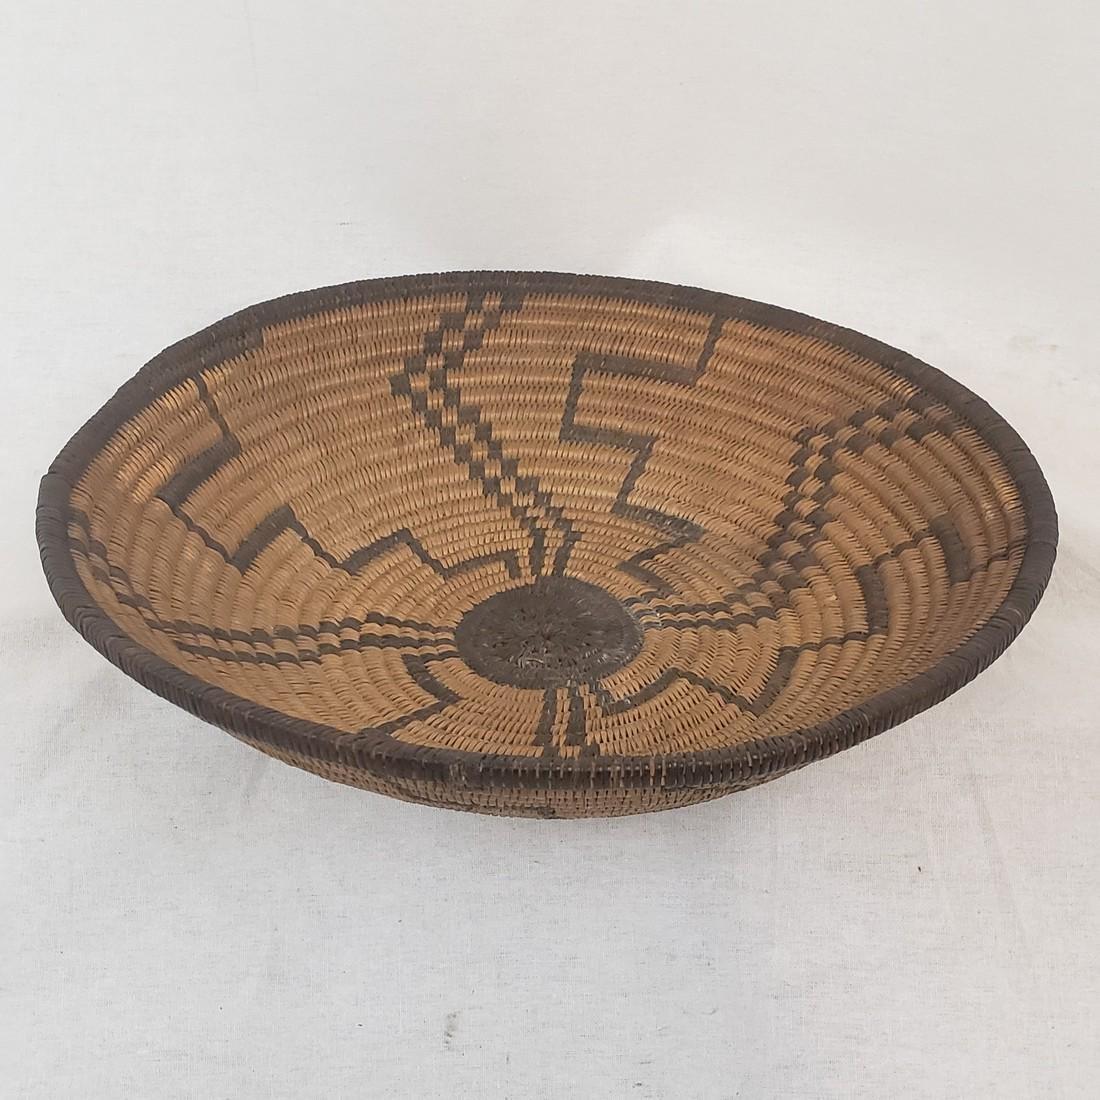 Fine Apache geometric basket ca 1900-1920 - 2